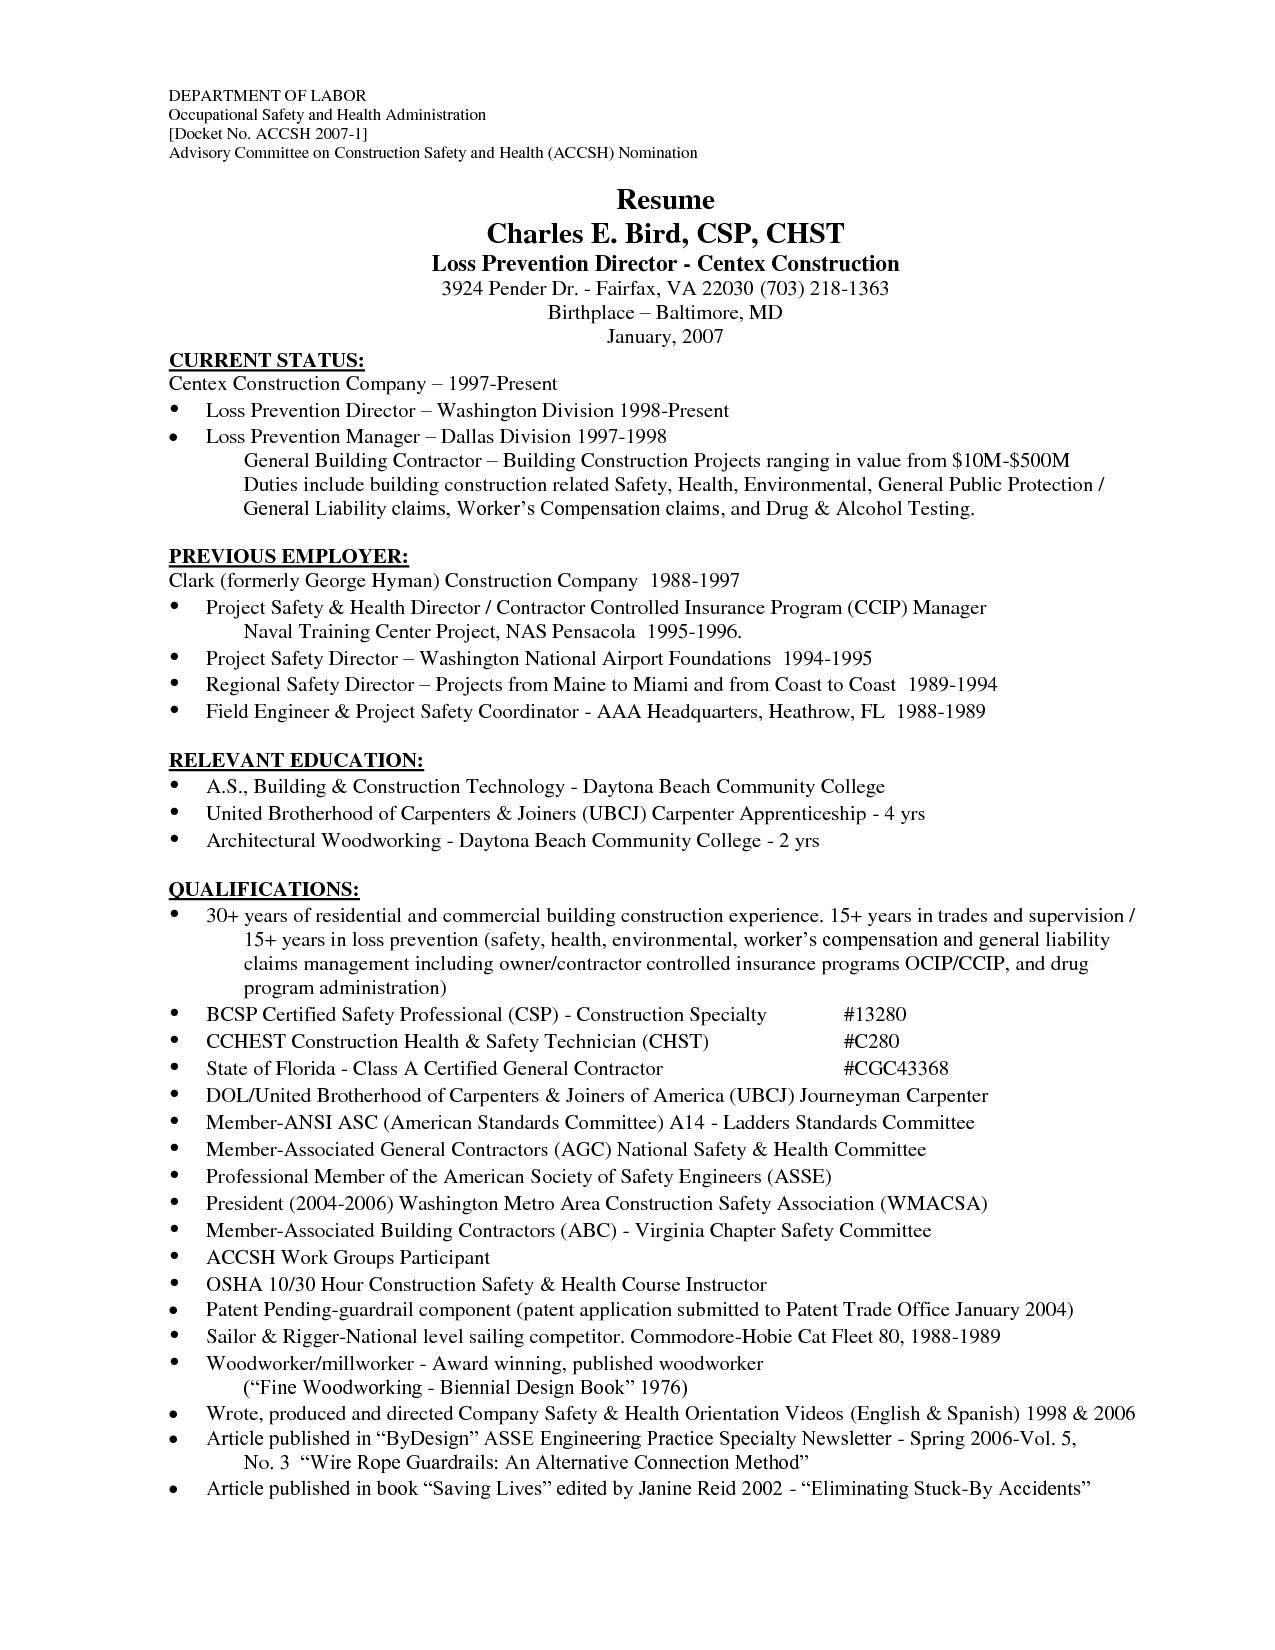 Sample Laborer Resume Templates